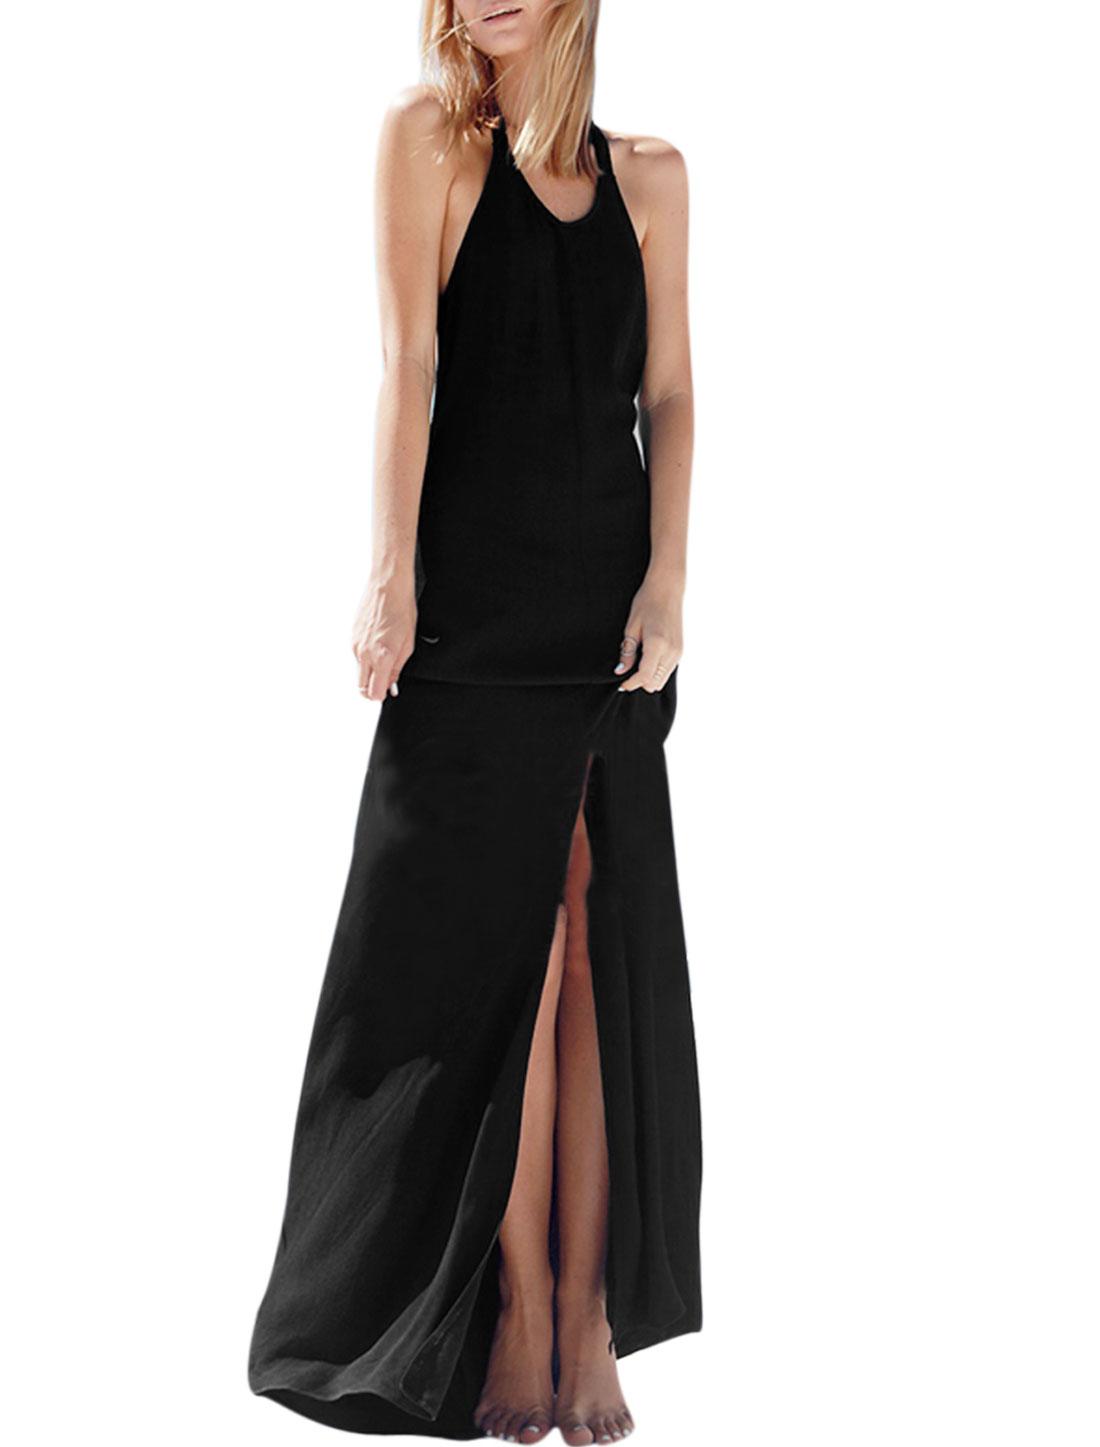 Women Scoop Neck Sleeveless Open Back Split Hem Maxi Dress Black M